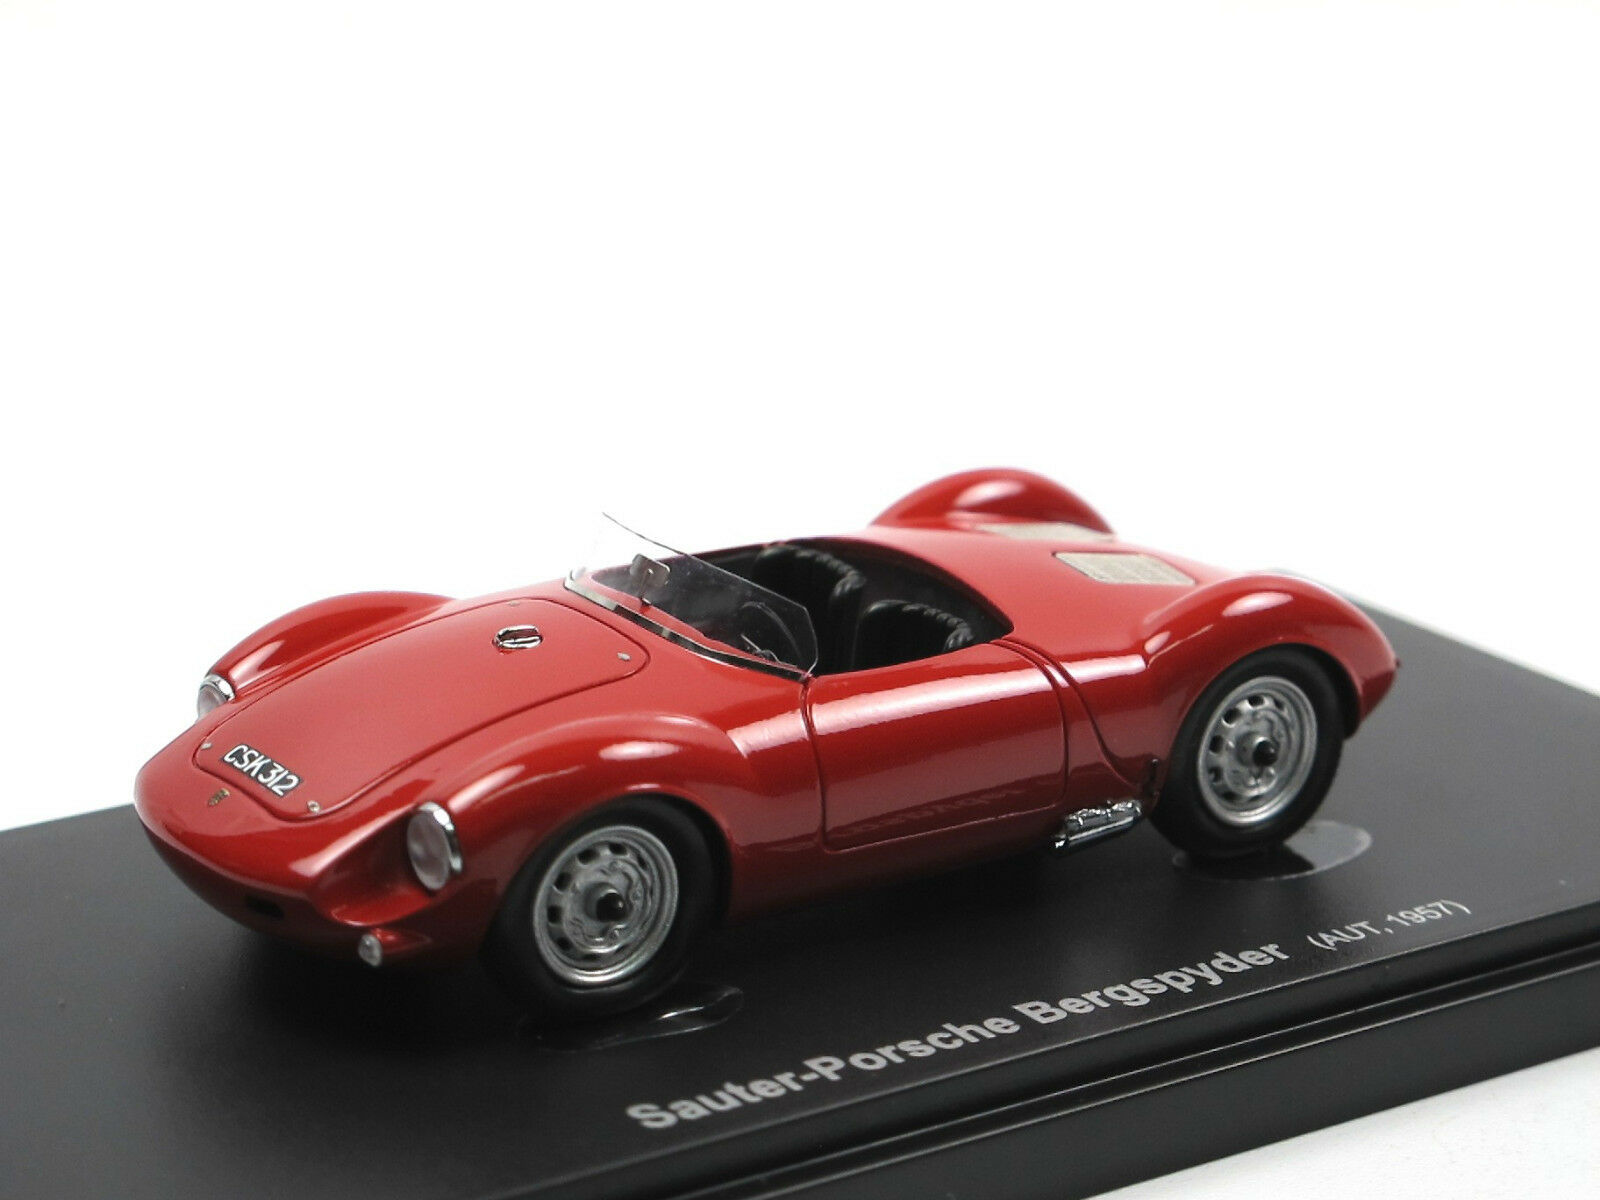 Avenue 43 1957 Sauter -Porsche Bergspyder röta hkonstse 1  43 bilCult modellllerler